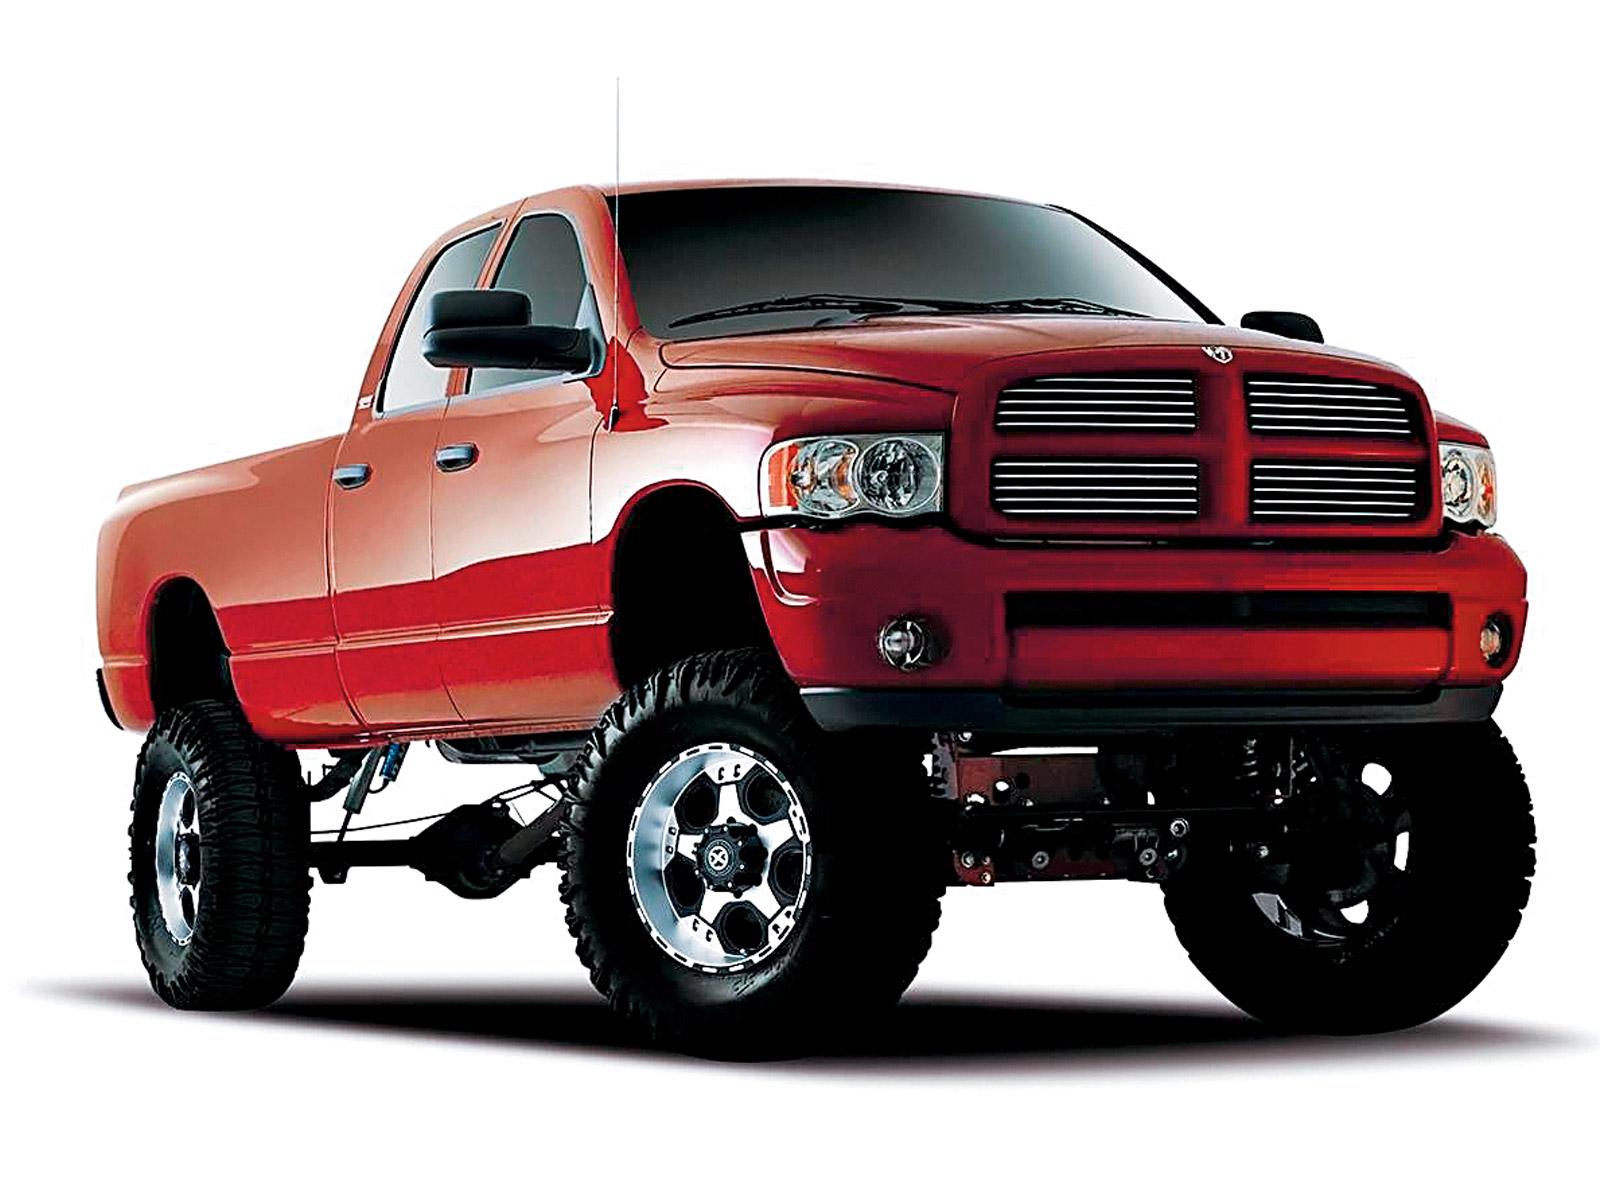 Dodge Truck Wallpaper 1600x1200